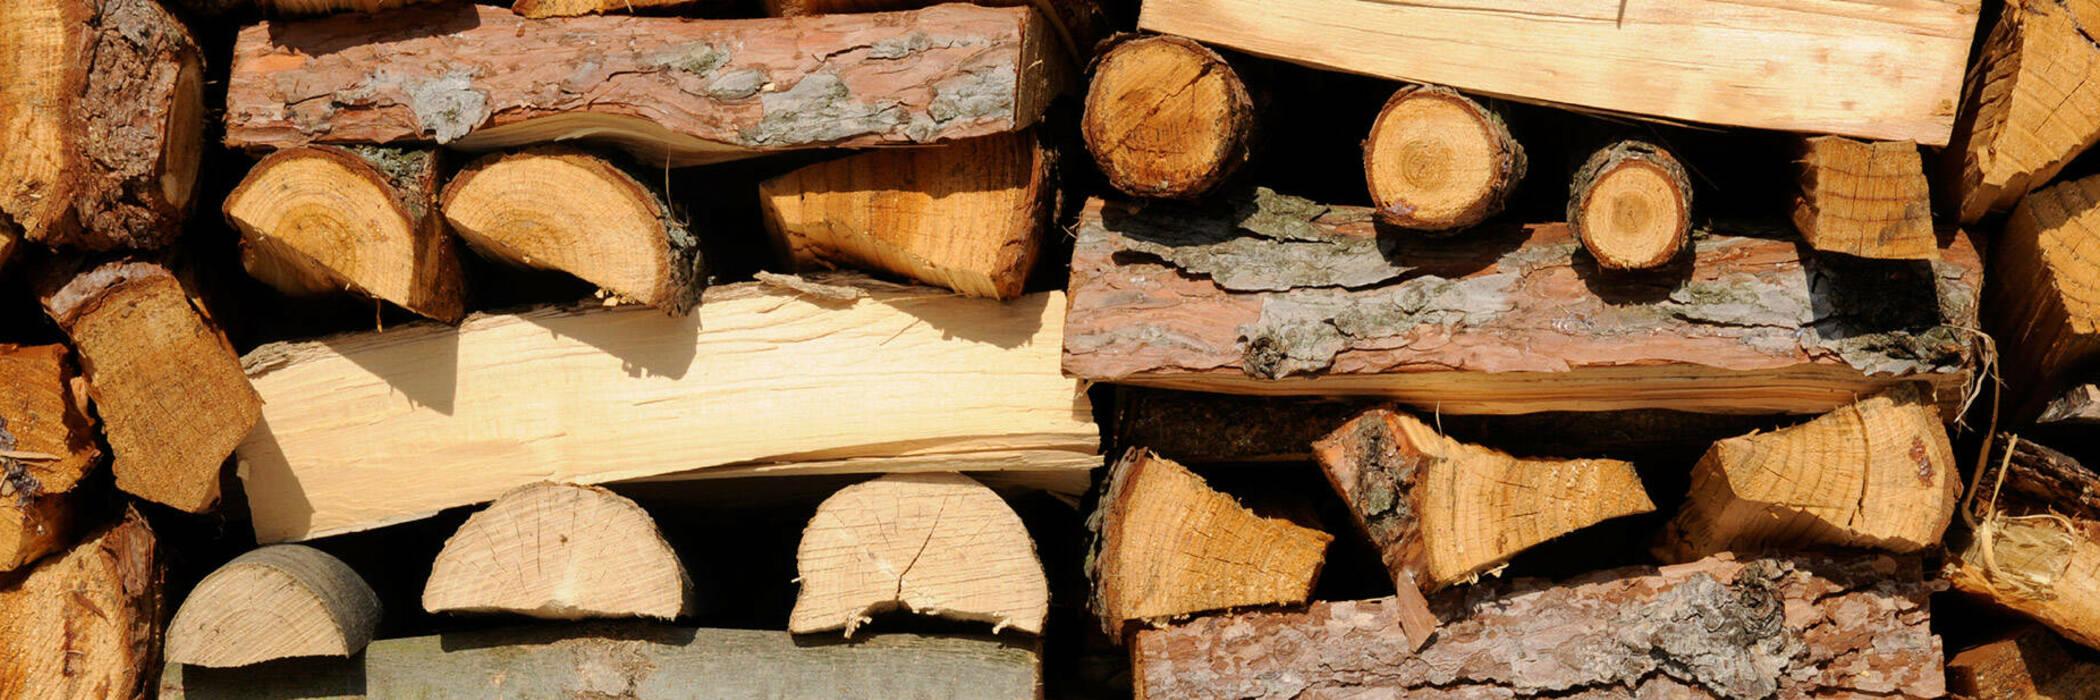 12aug woodpile hero